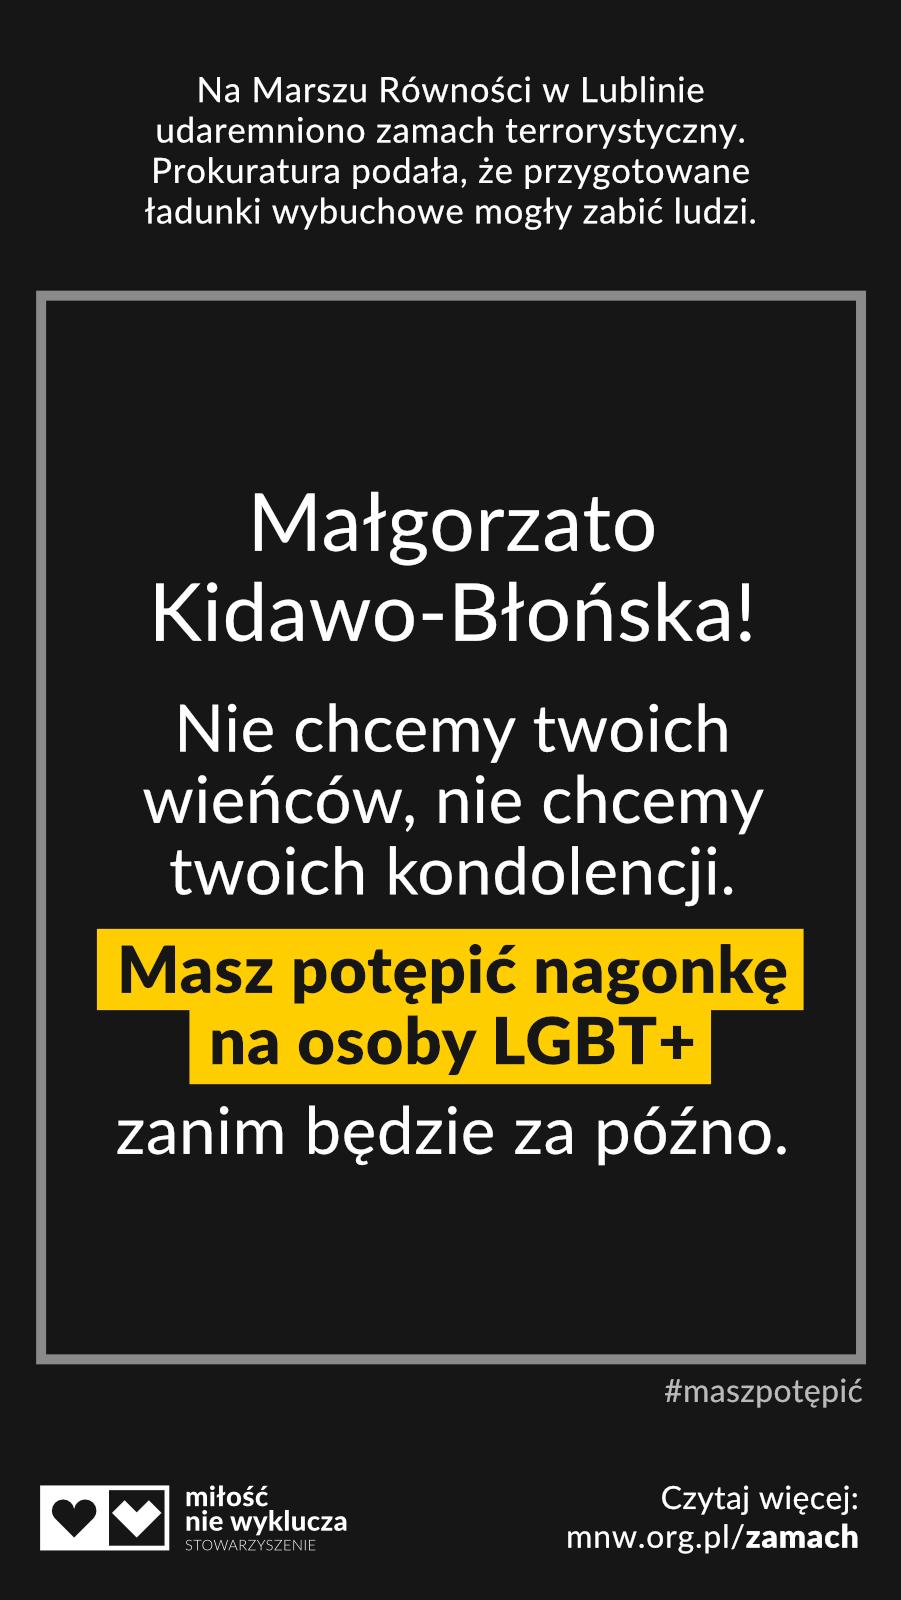 Kidawa-Błońska #maszpotepic zamach LGBT+